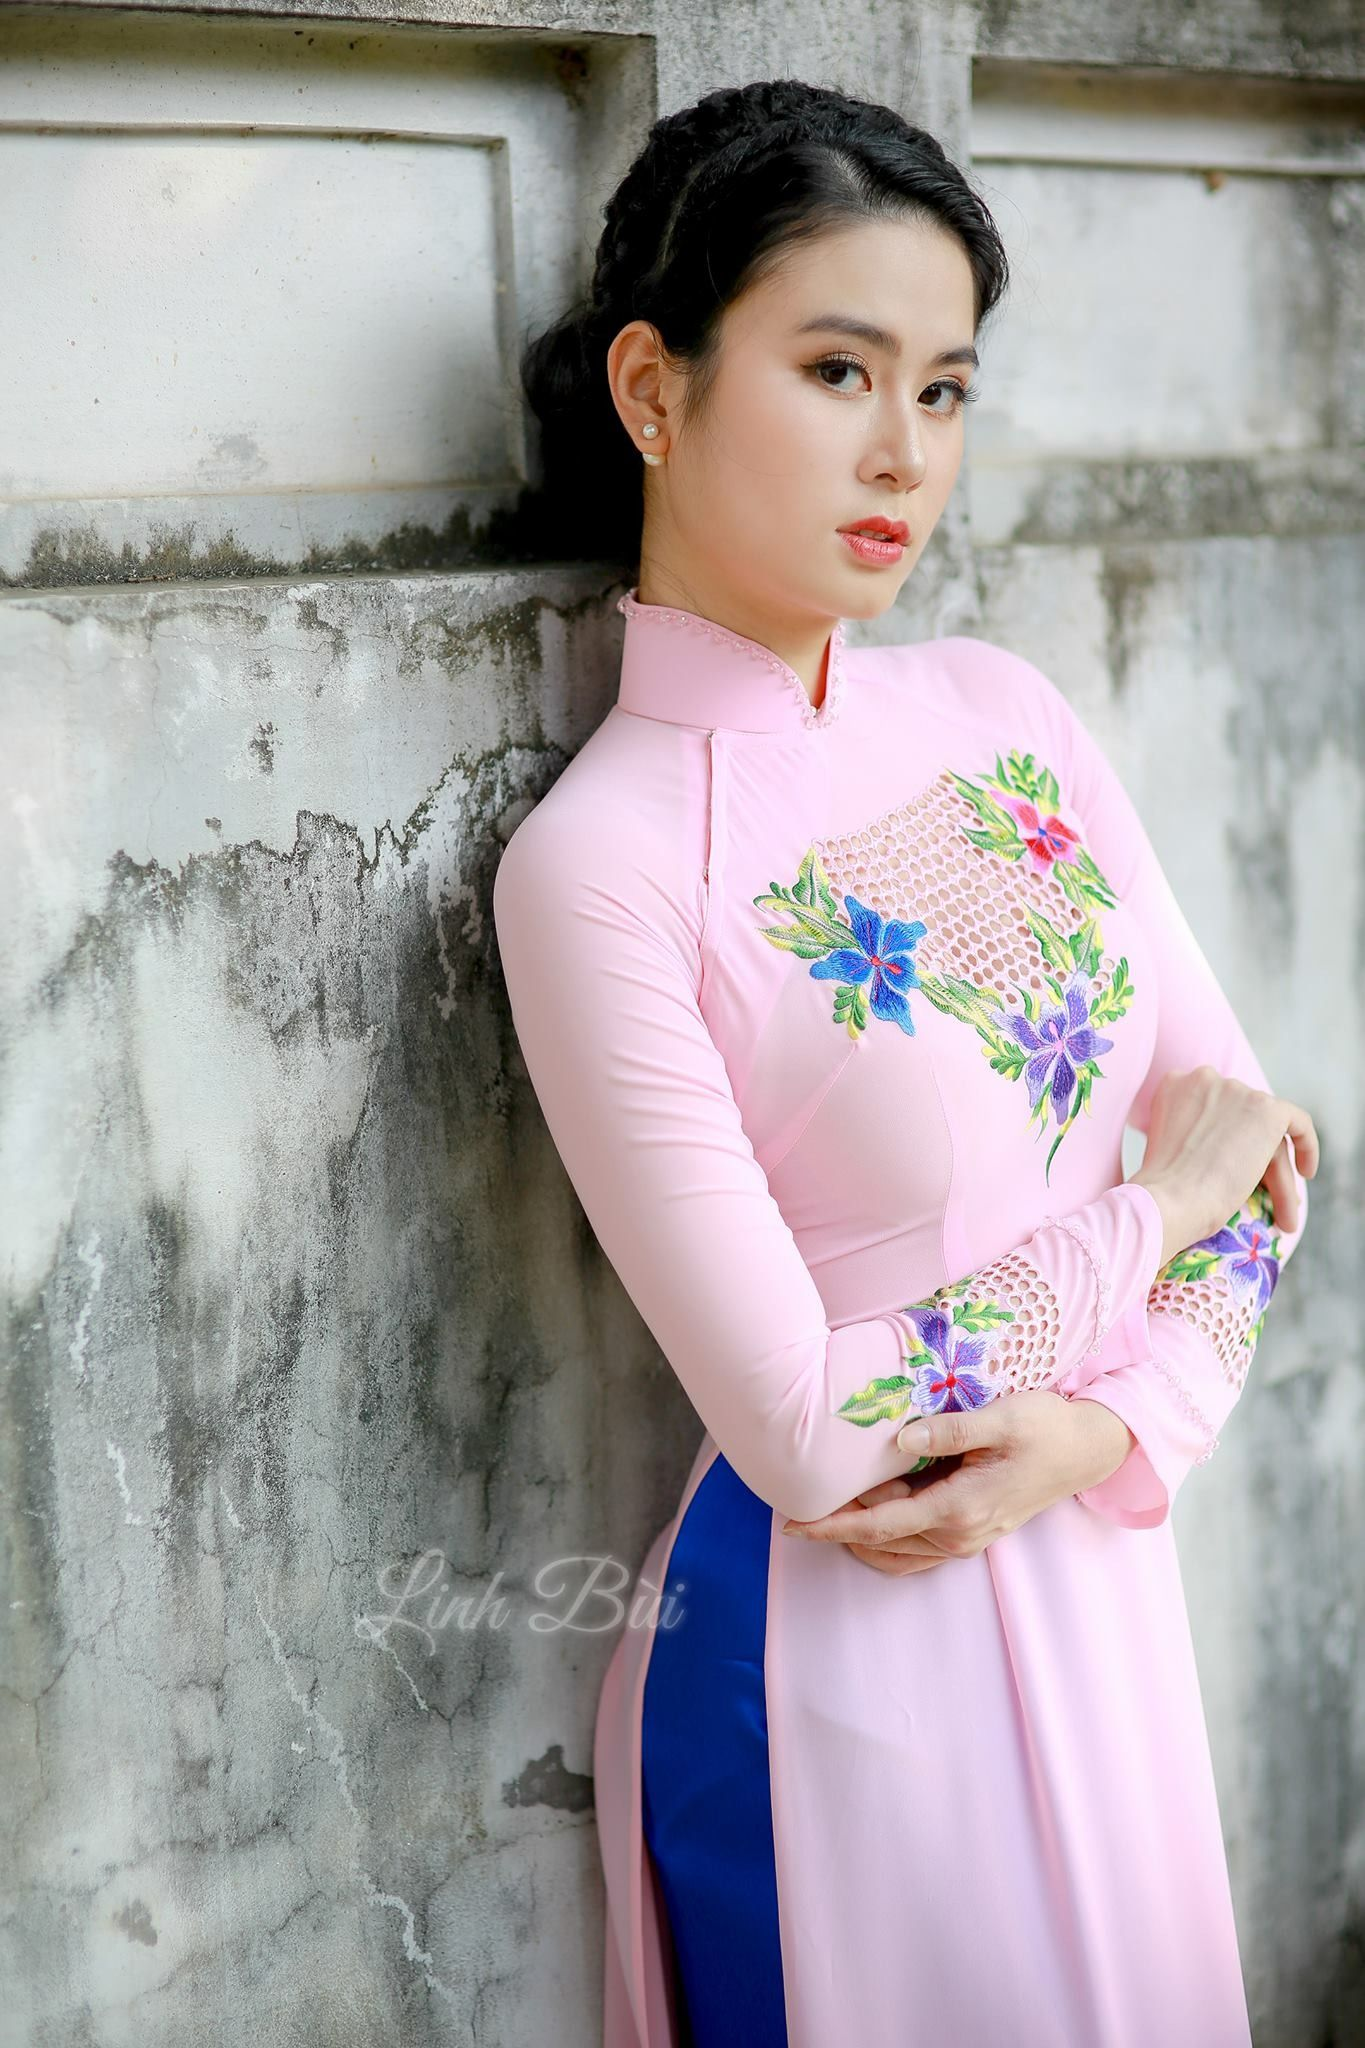 Bui Phuong Linh | Babe | Pinterest